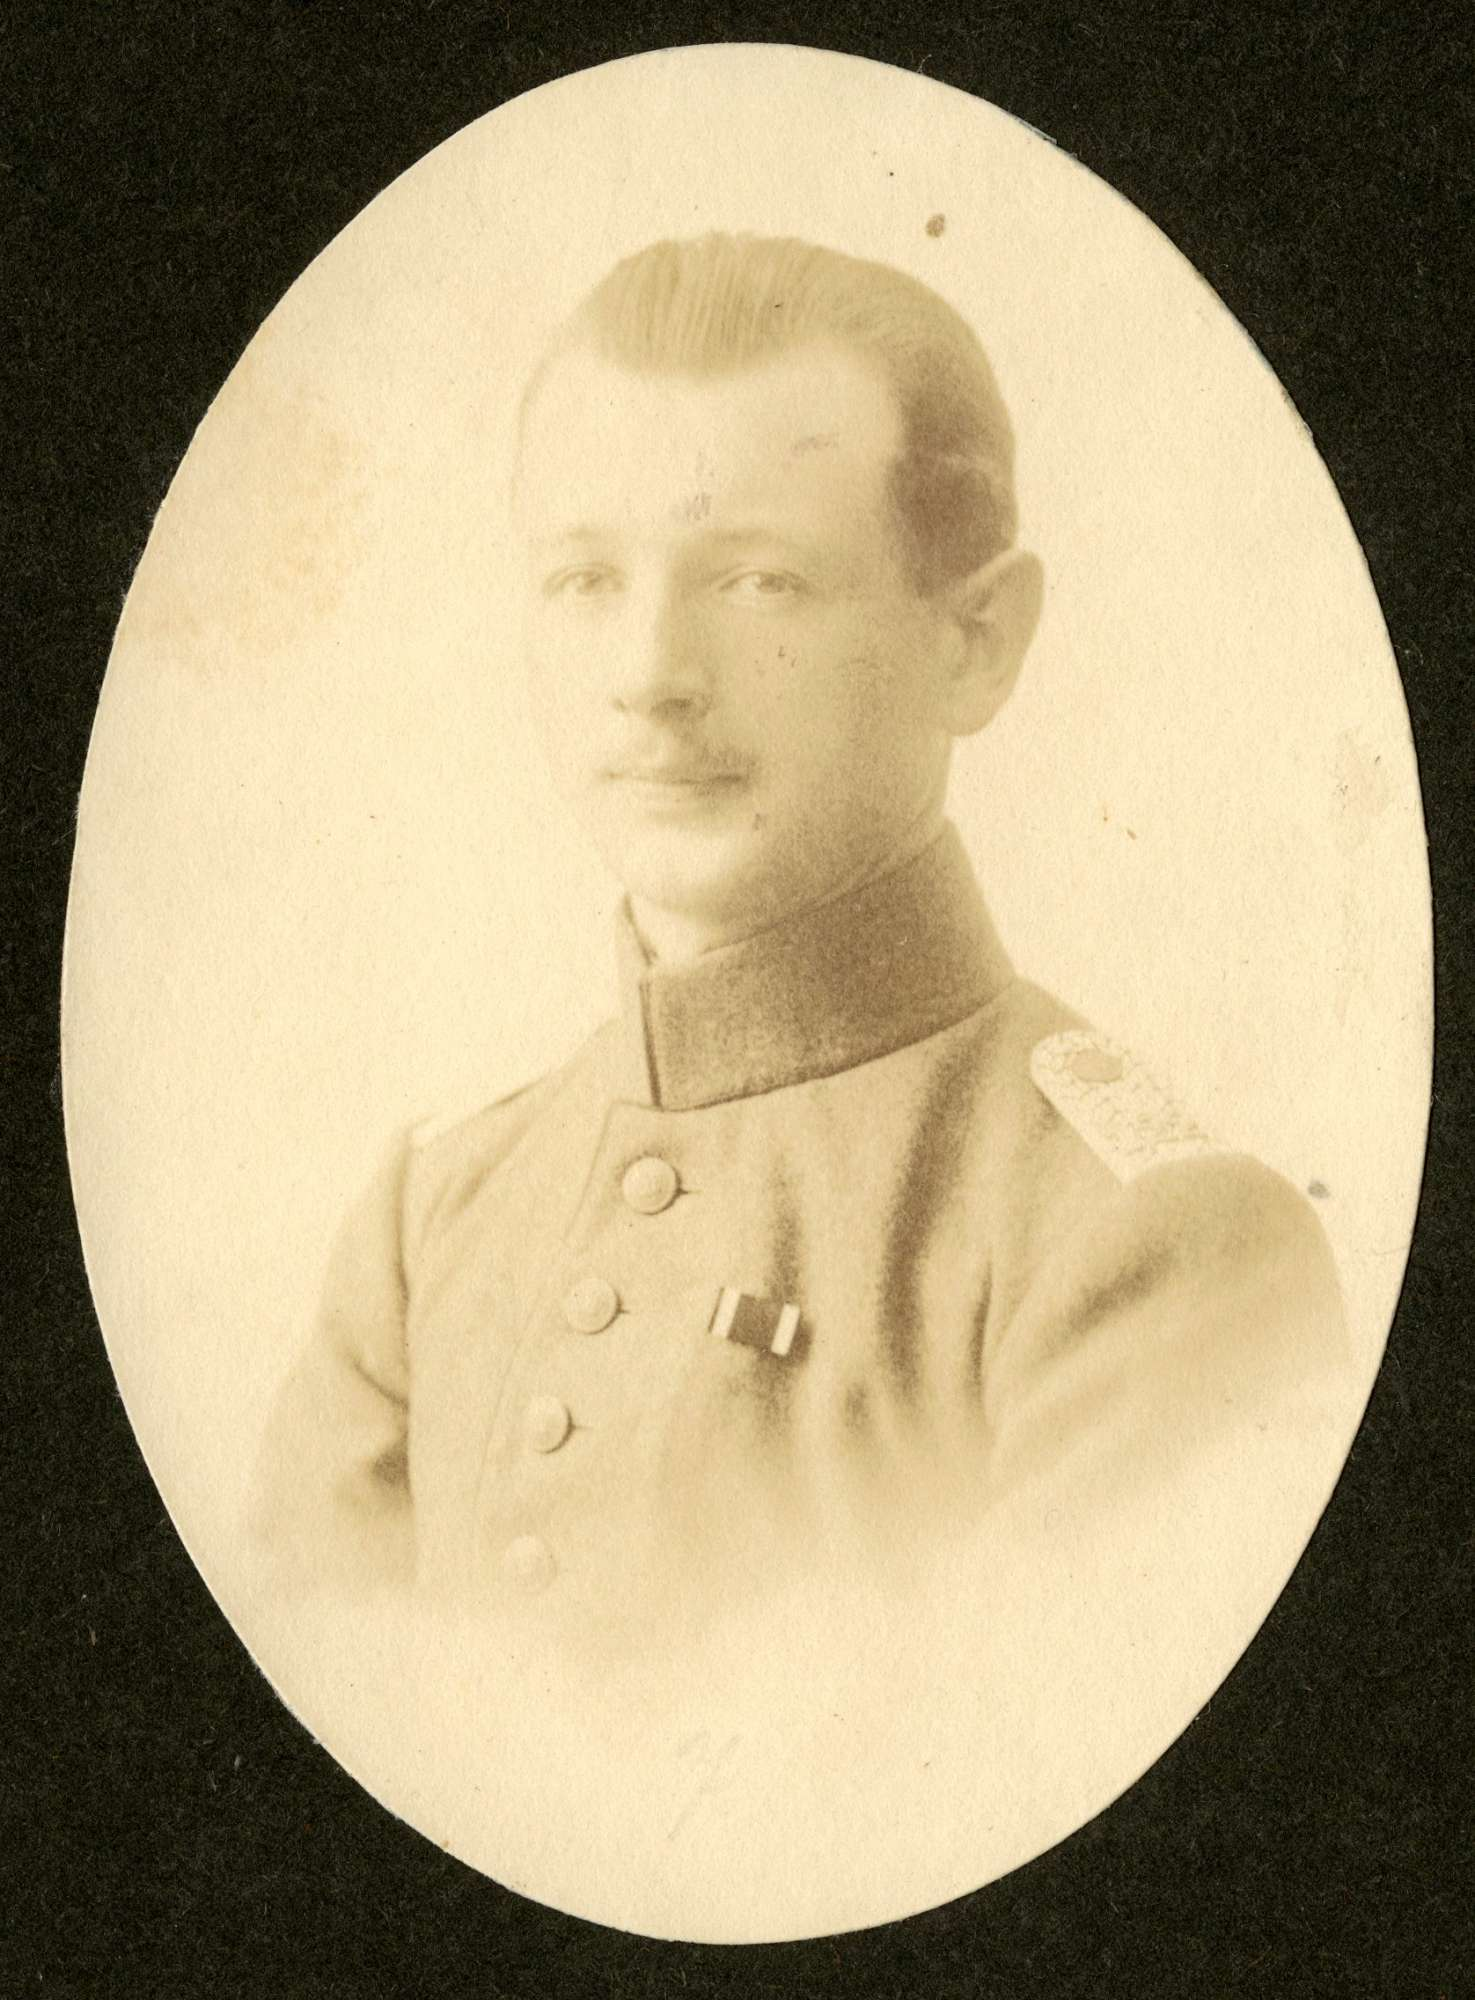 Schafferdt, Eugen, Bild 1